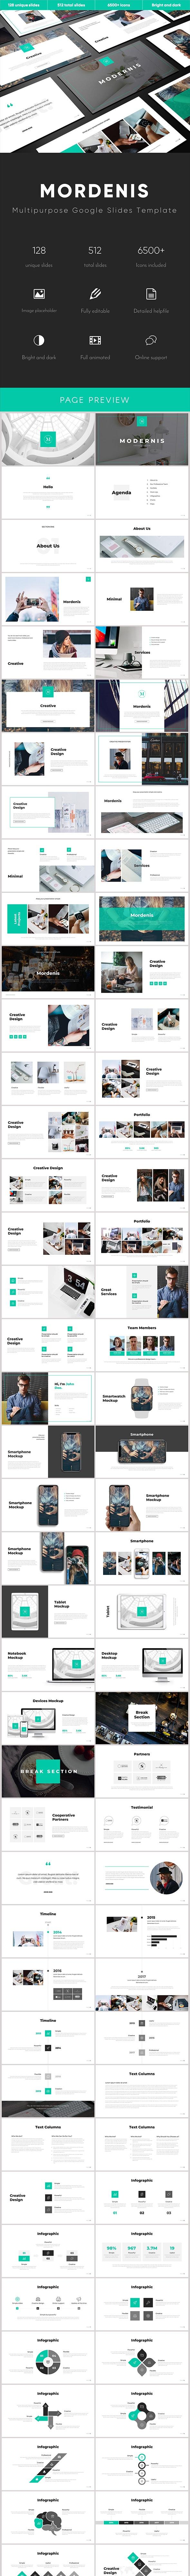 Mordenis Multipurpose Google Slides Template - Google Slides Presentation Templates